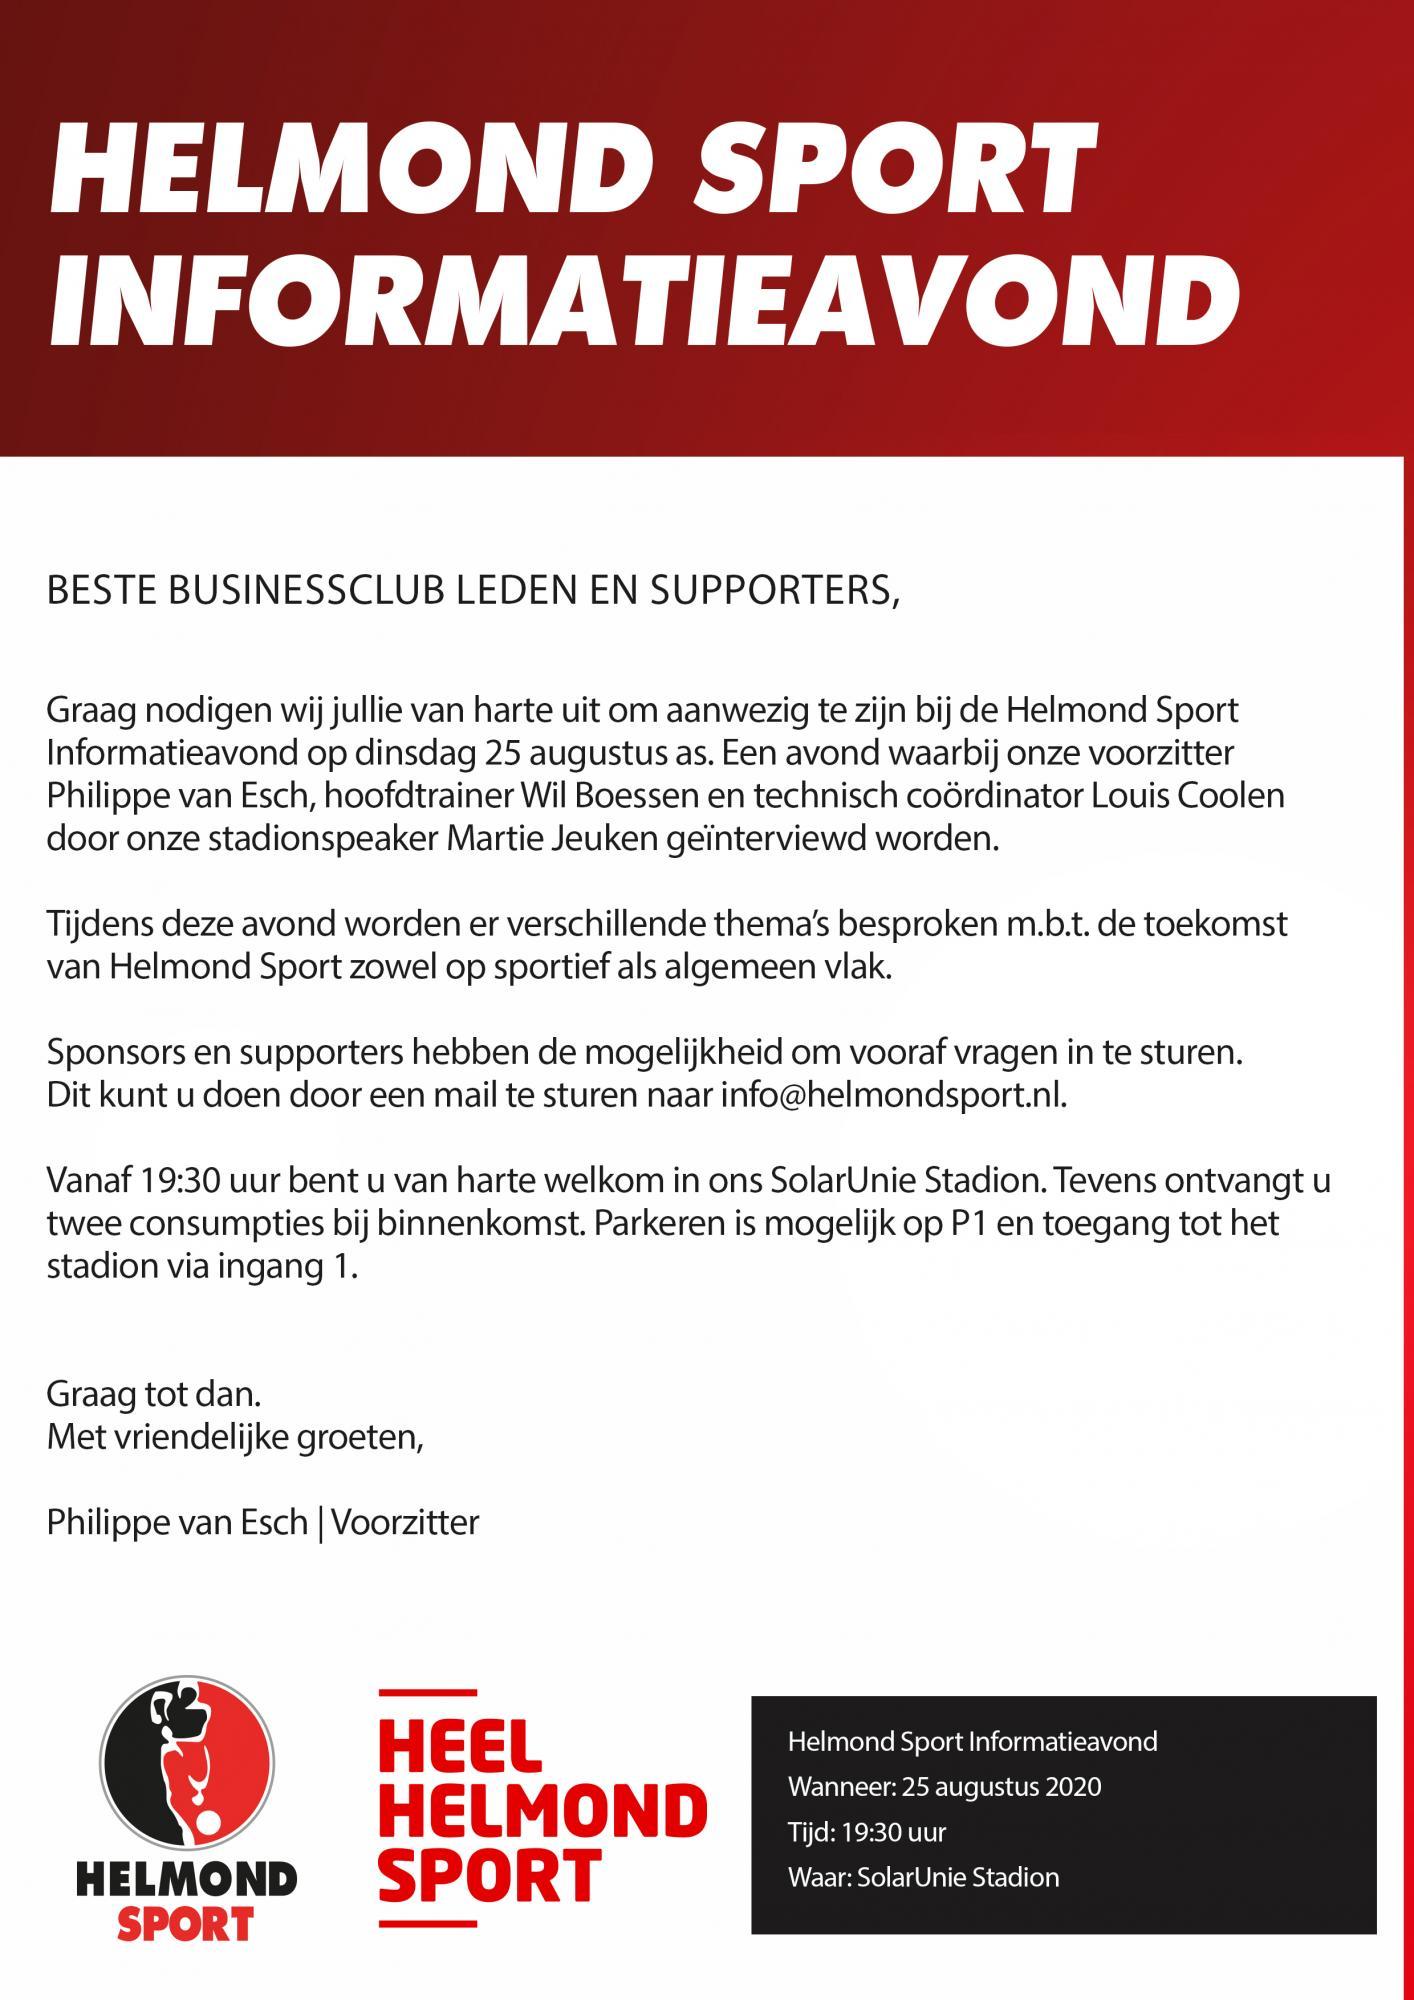 Helmond Sport Informatieavond_1.jpg